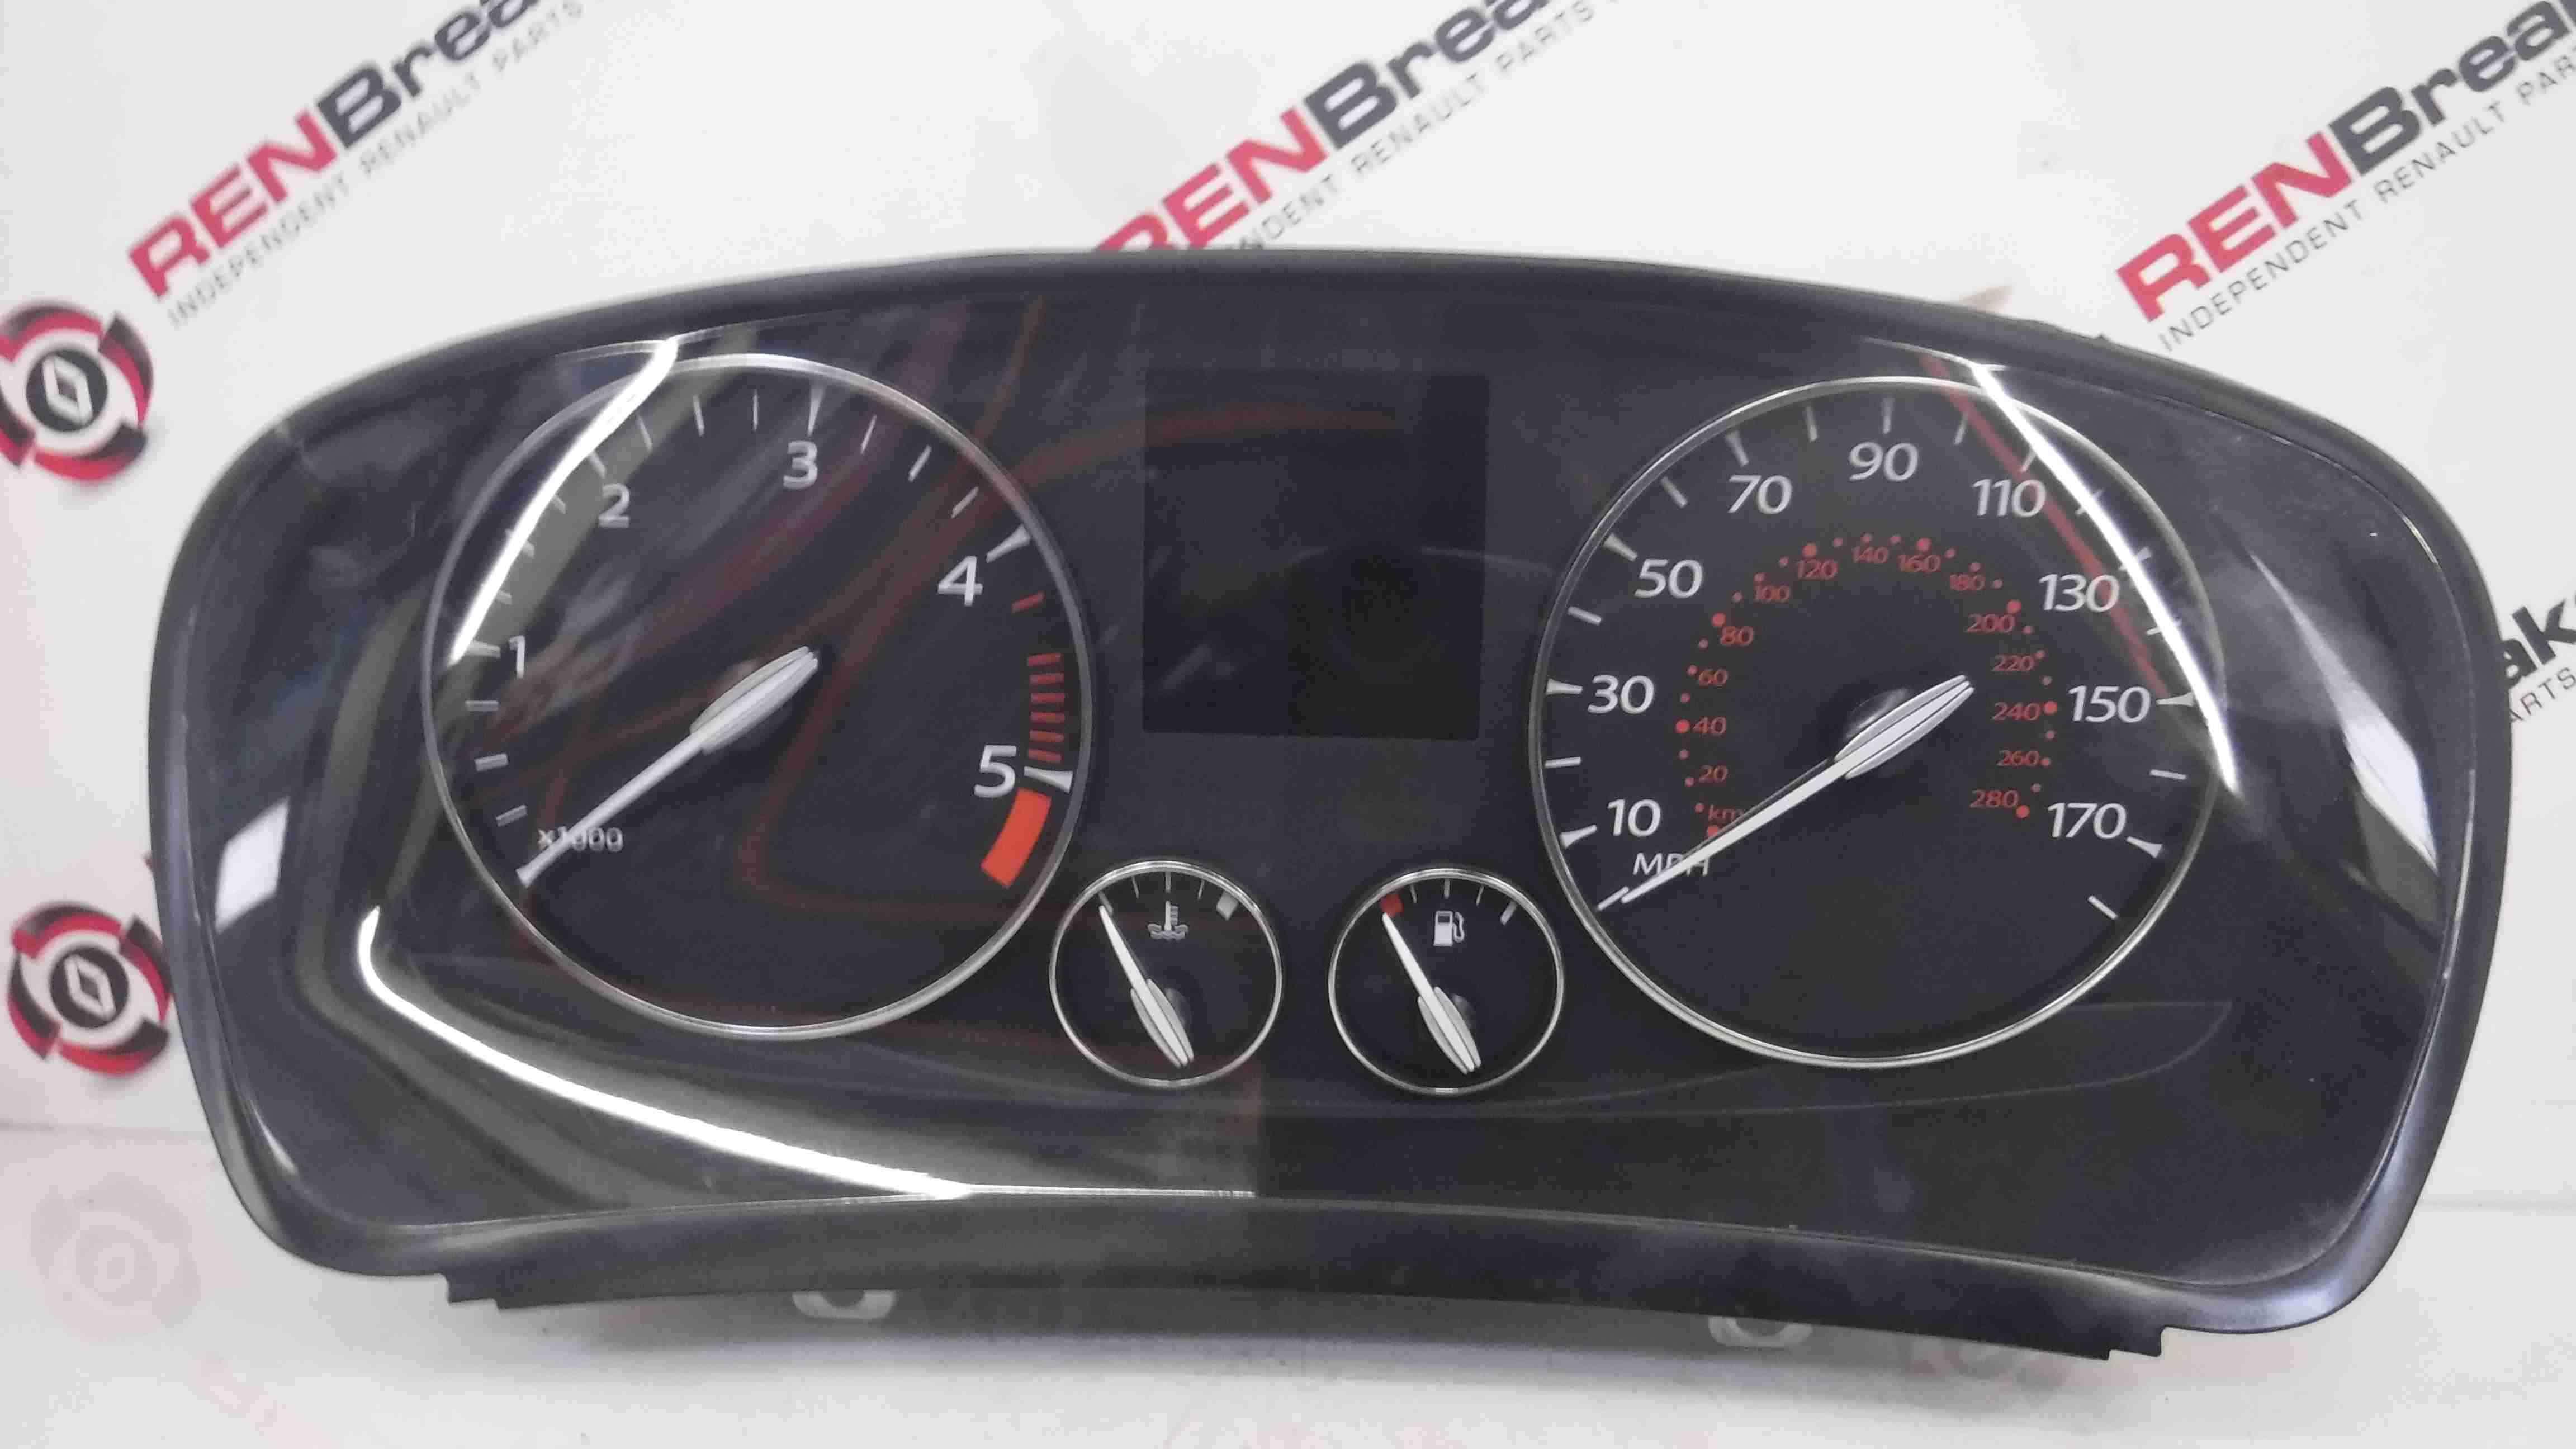 Renault Laguna MK3 2007-2010 Instrument Panel Dials 155k 248100014R